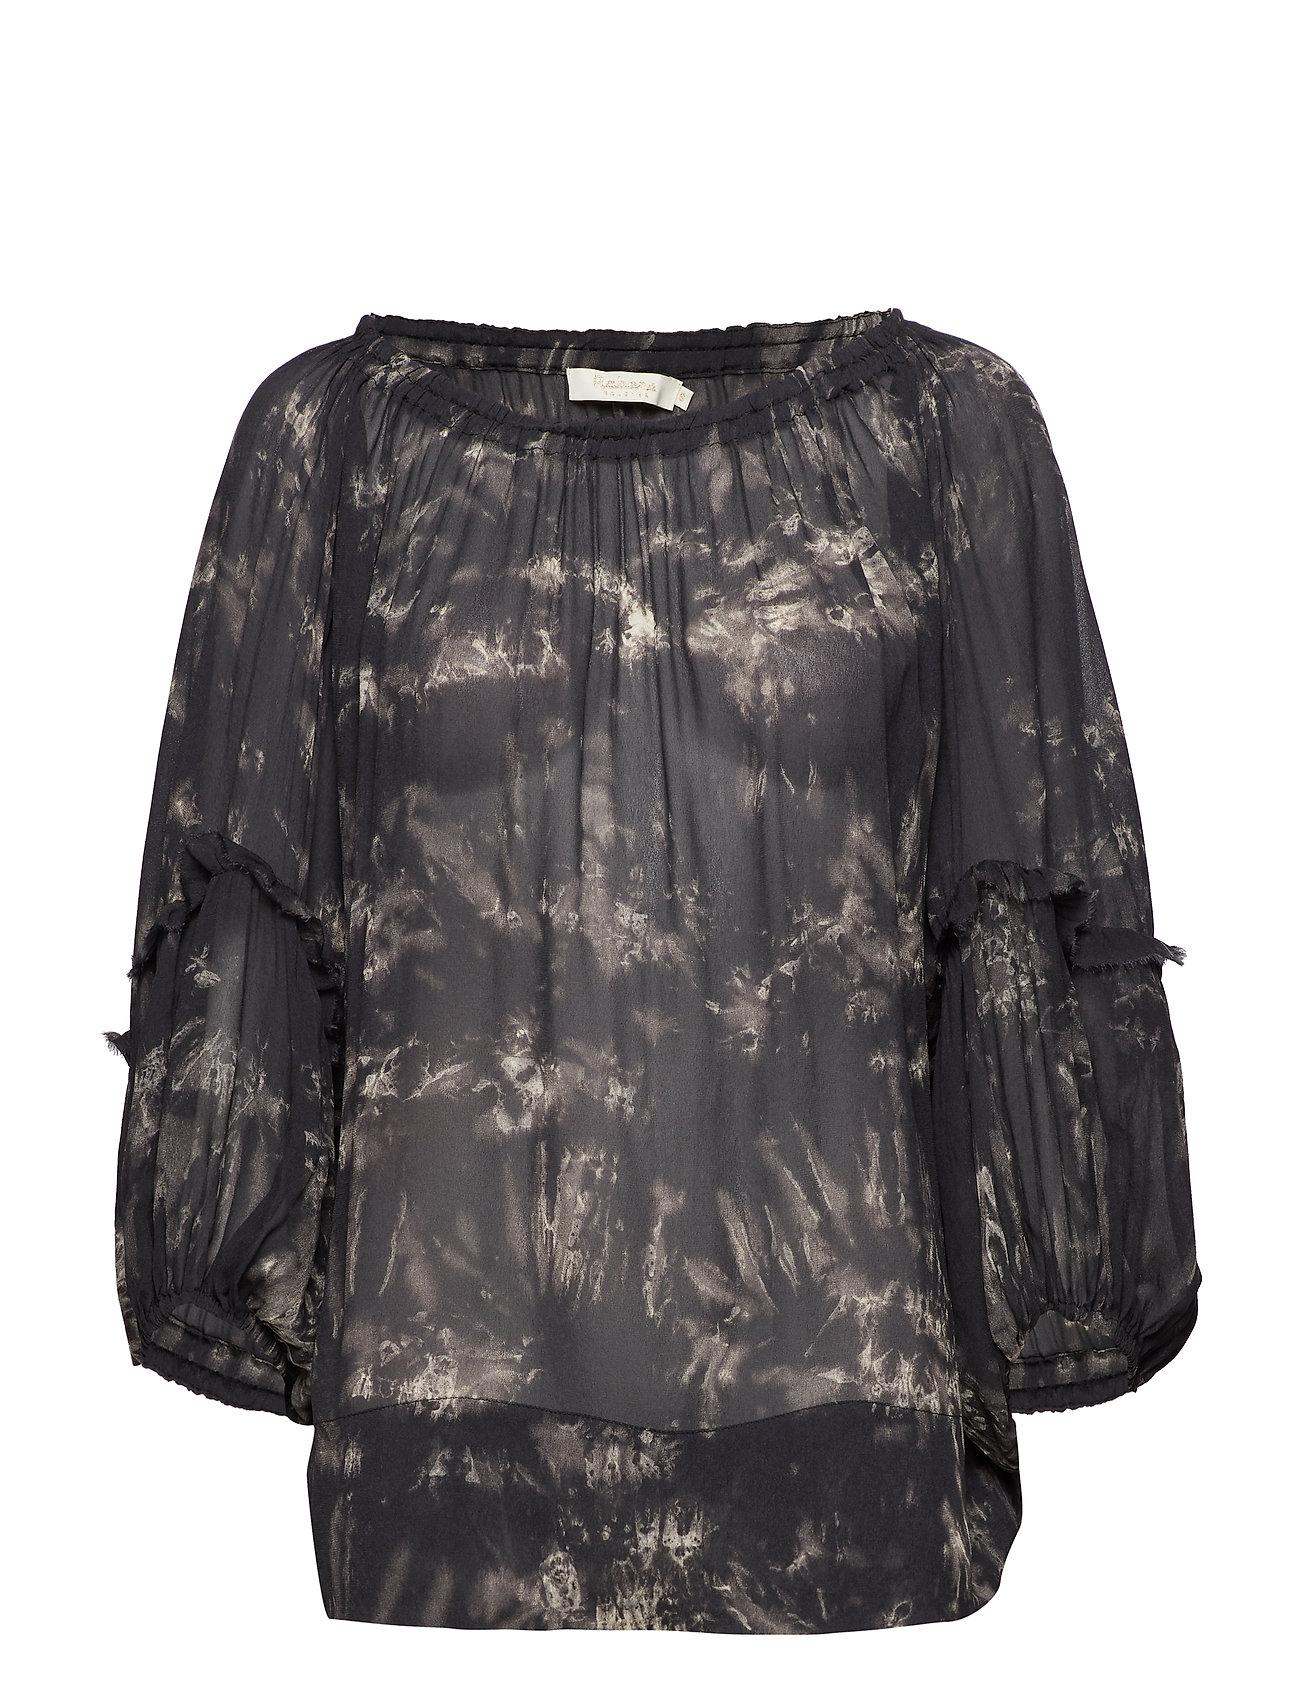 Rabens Saloner Wave blouse Ögrönlar